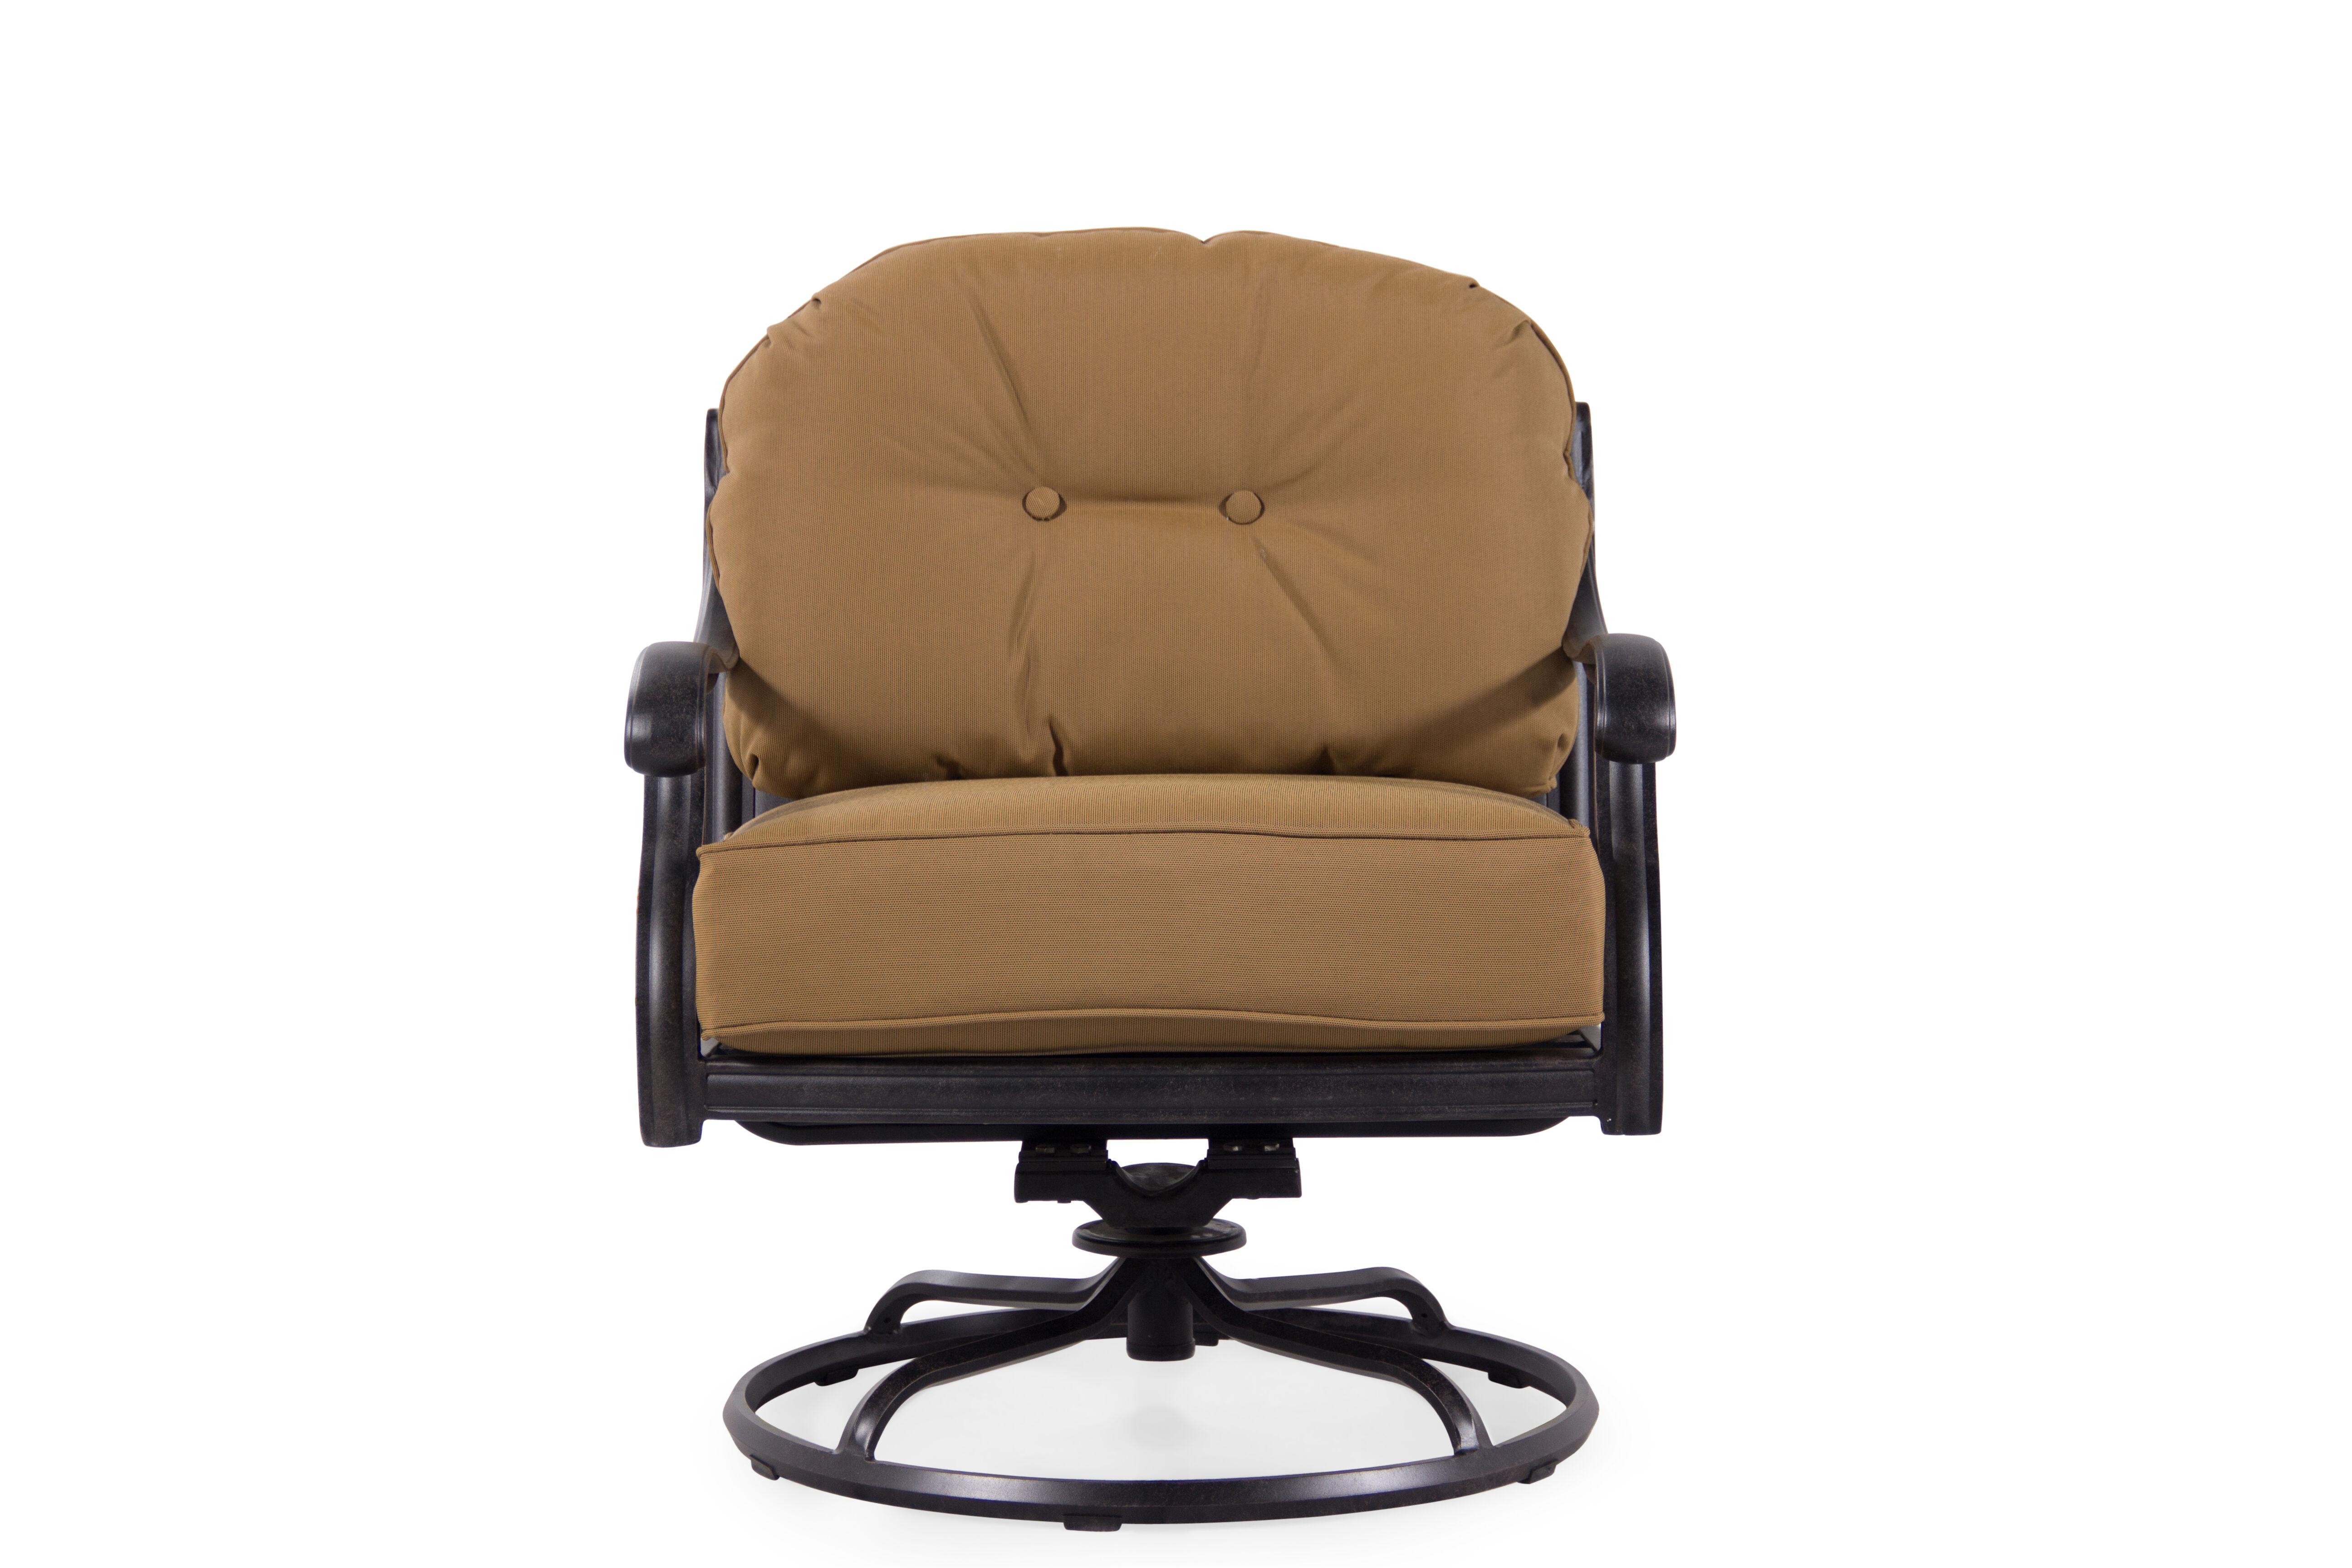 ButtonTufted Aluminum Swivel Club Chair in Cinnamon